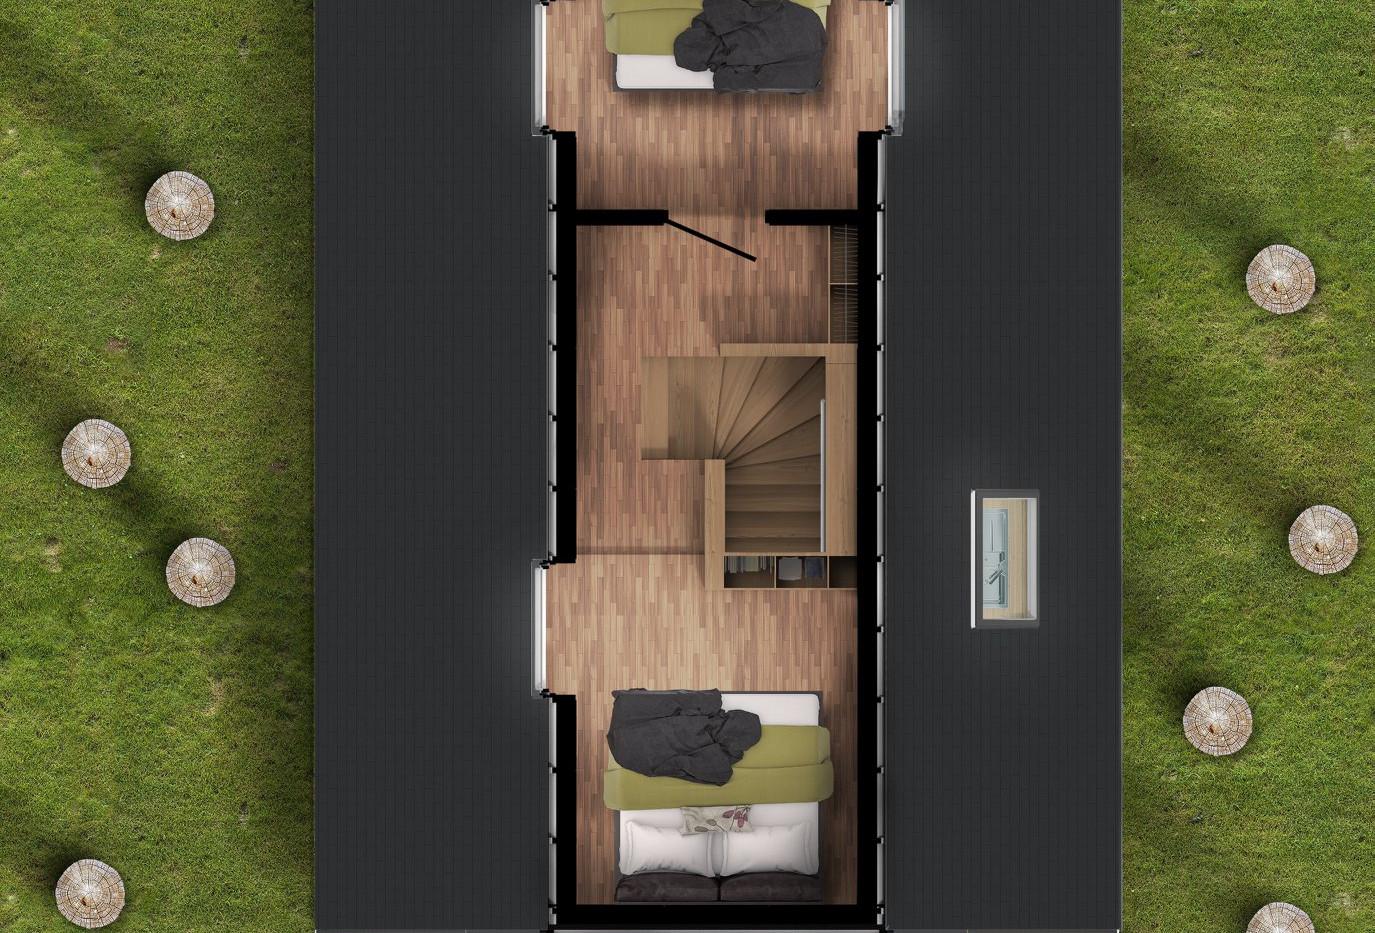 zen garden resort ház tetőtér.jpg